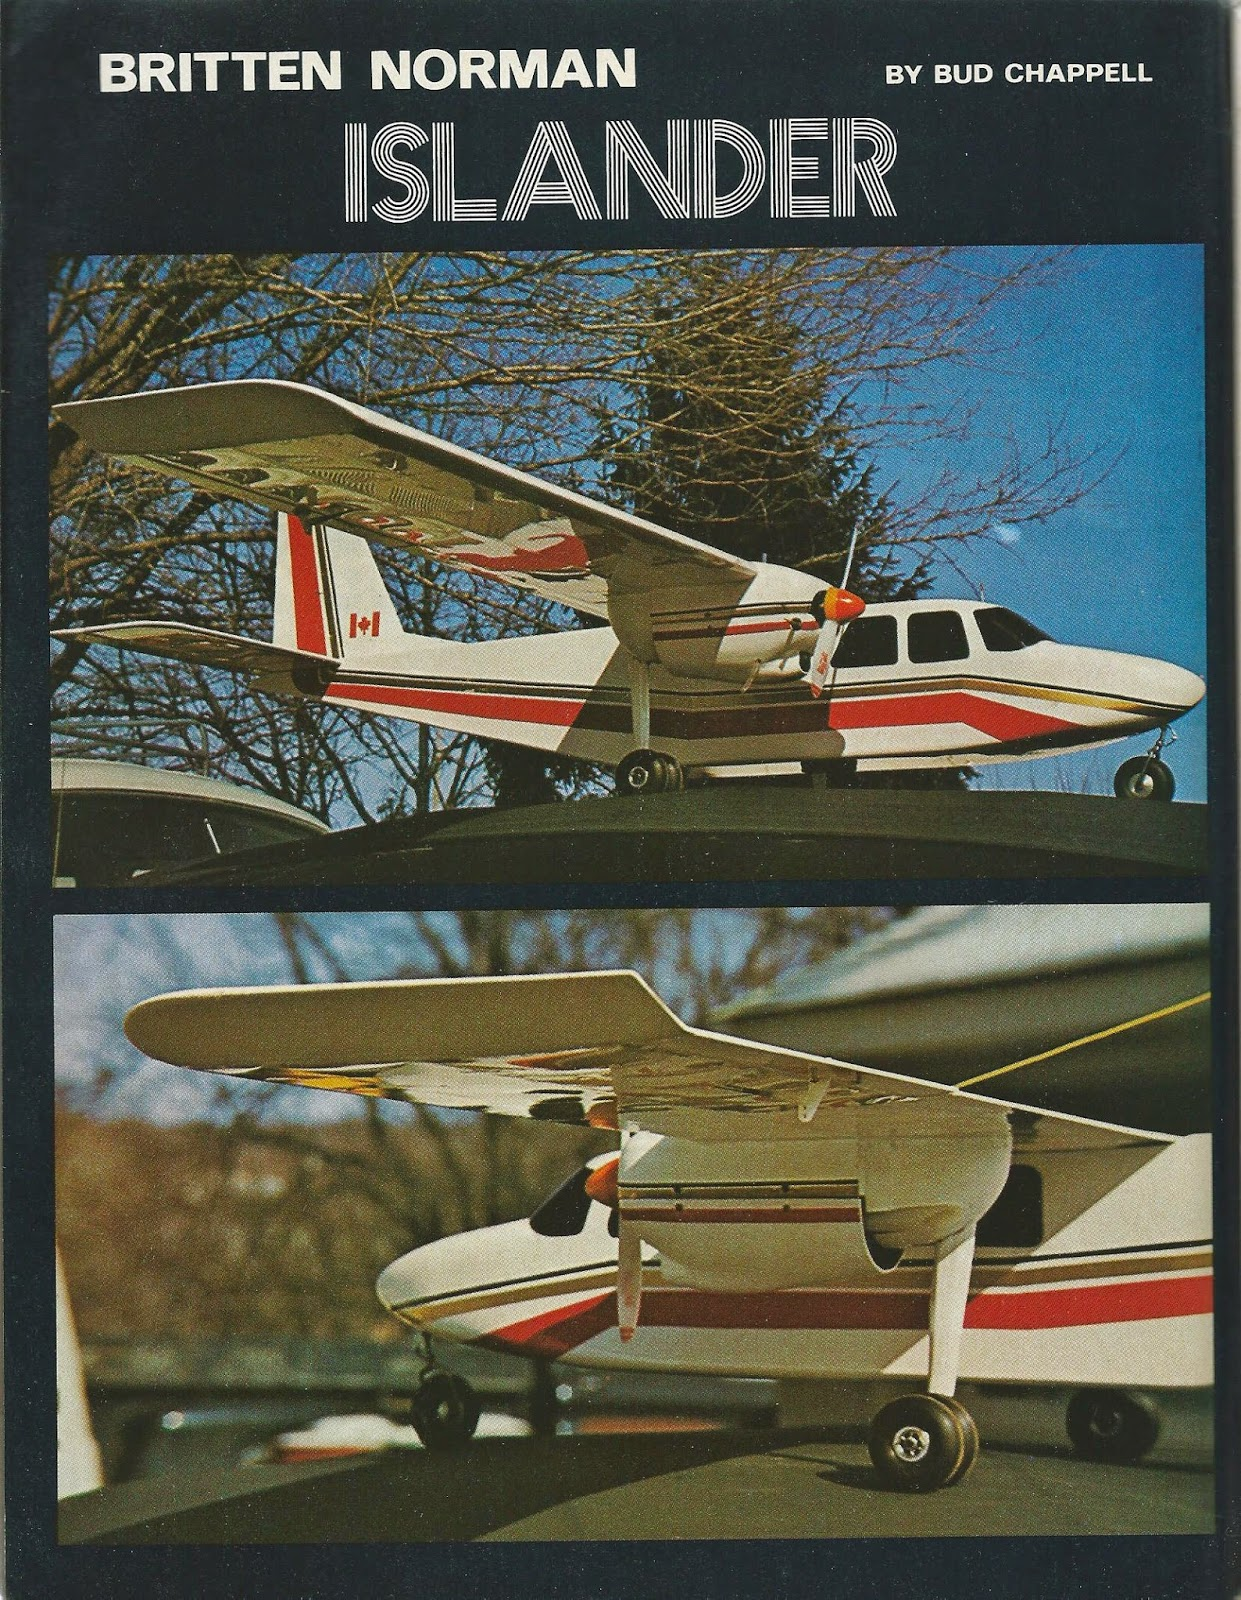 RCM *Britten-Norman Islander* Article and Plan